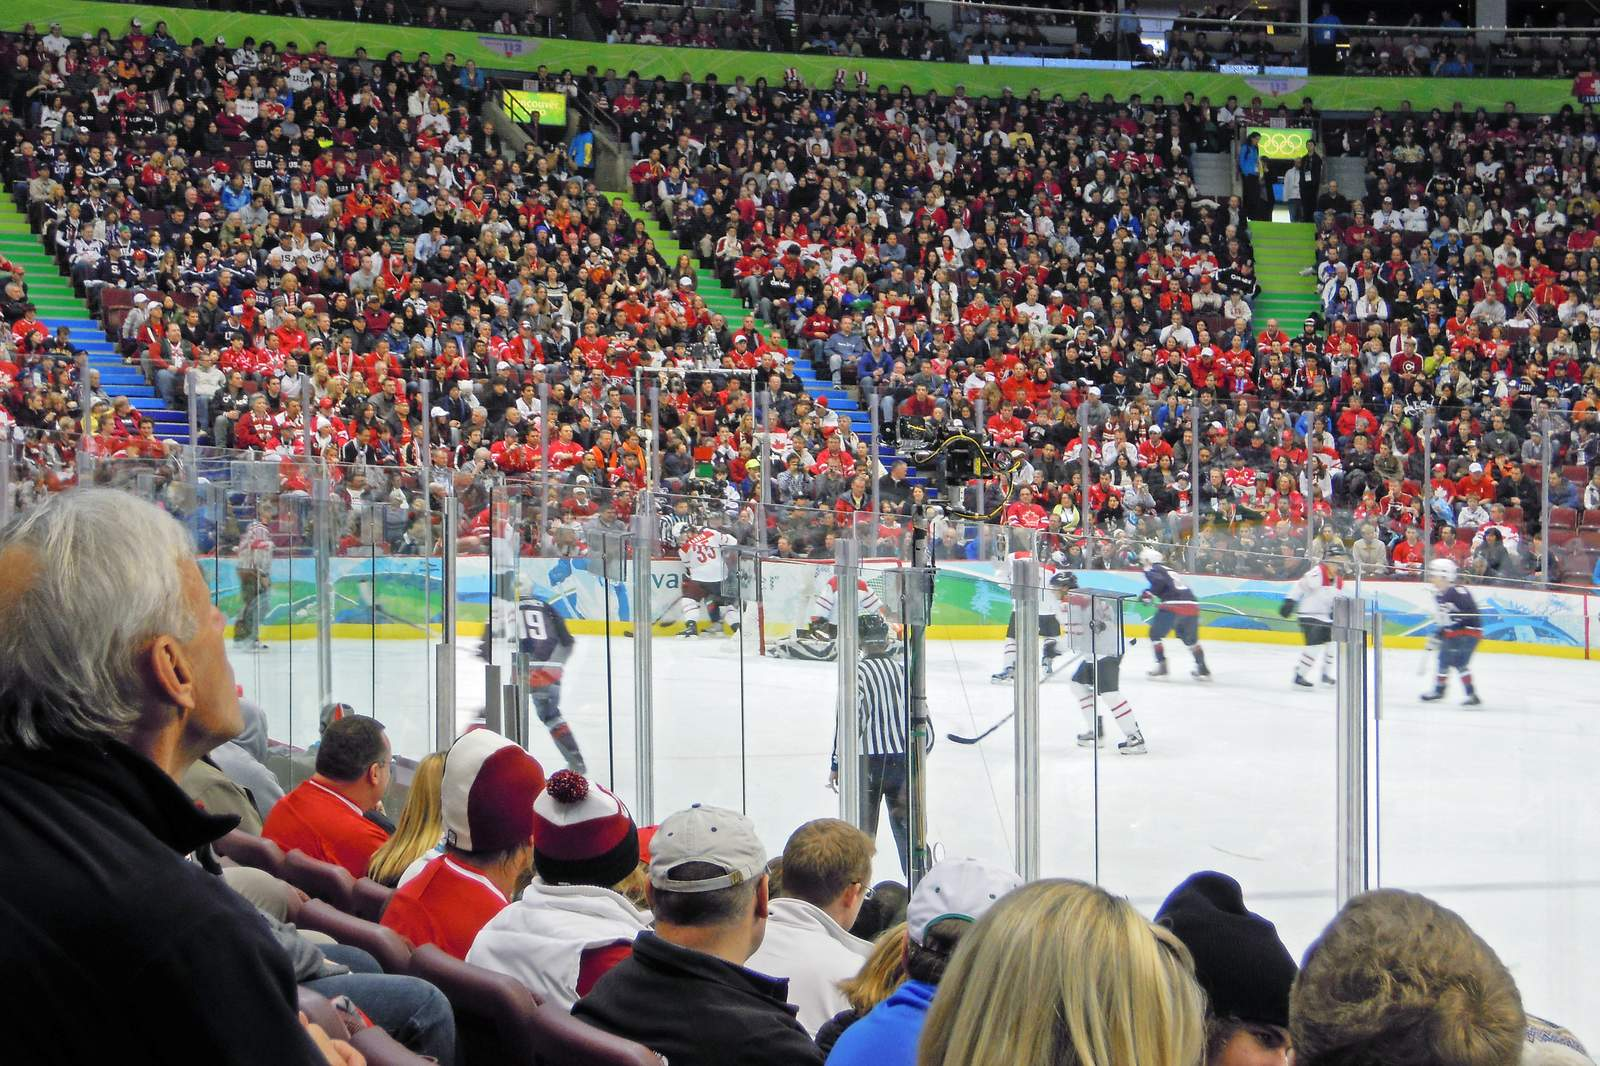 Action in der Rogers Arena